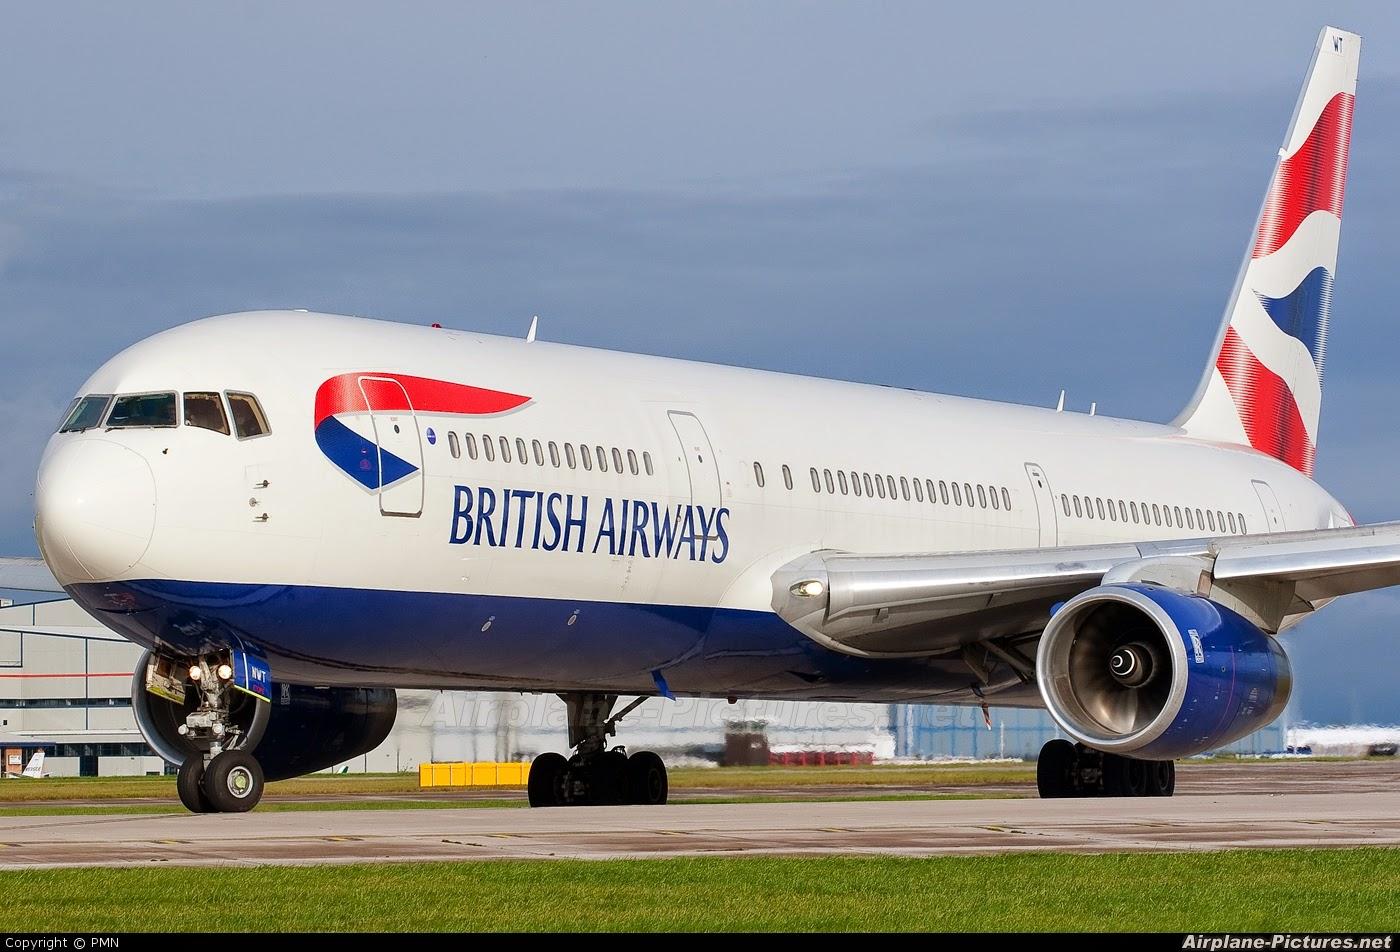 Ricky's Memoirs: BA Quickens Retirement of 767 Fleet